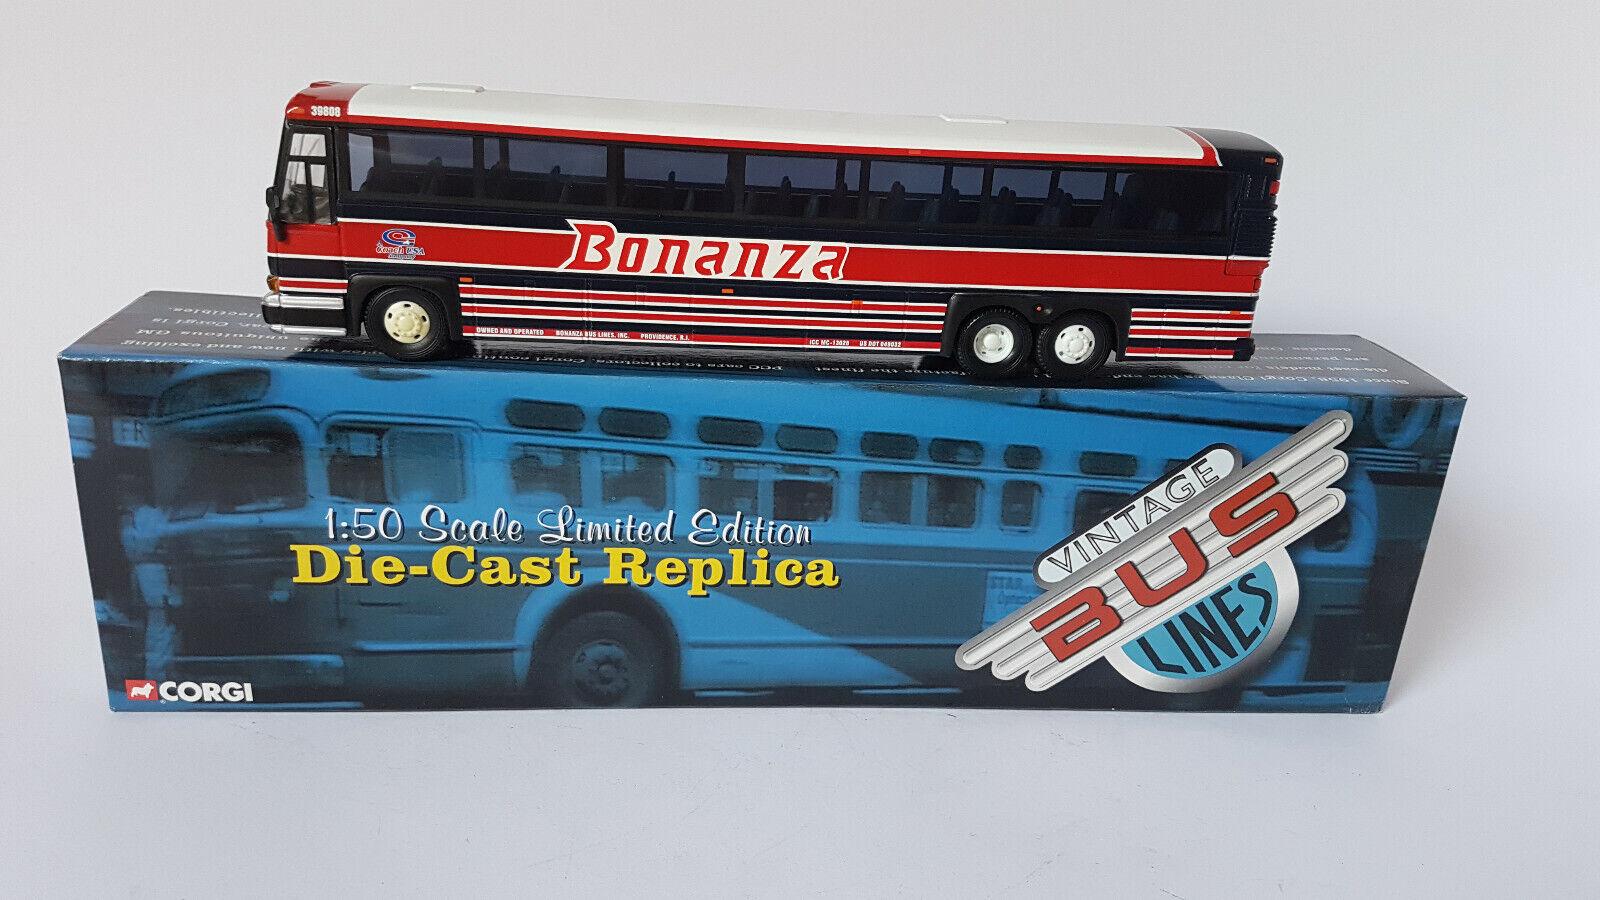 Corgi us-autobuses  bonanza  1 50 OVP